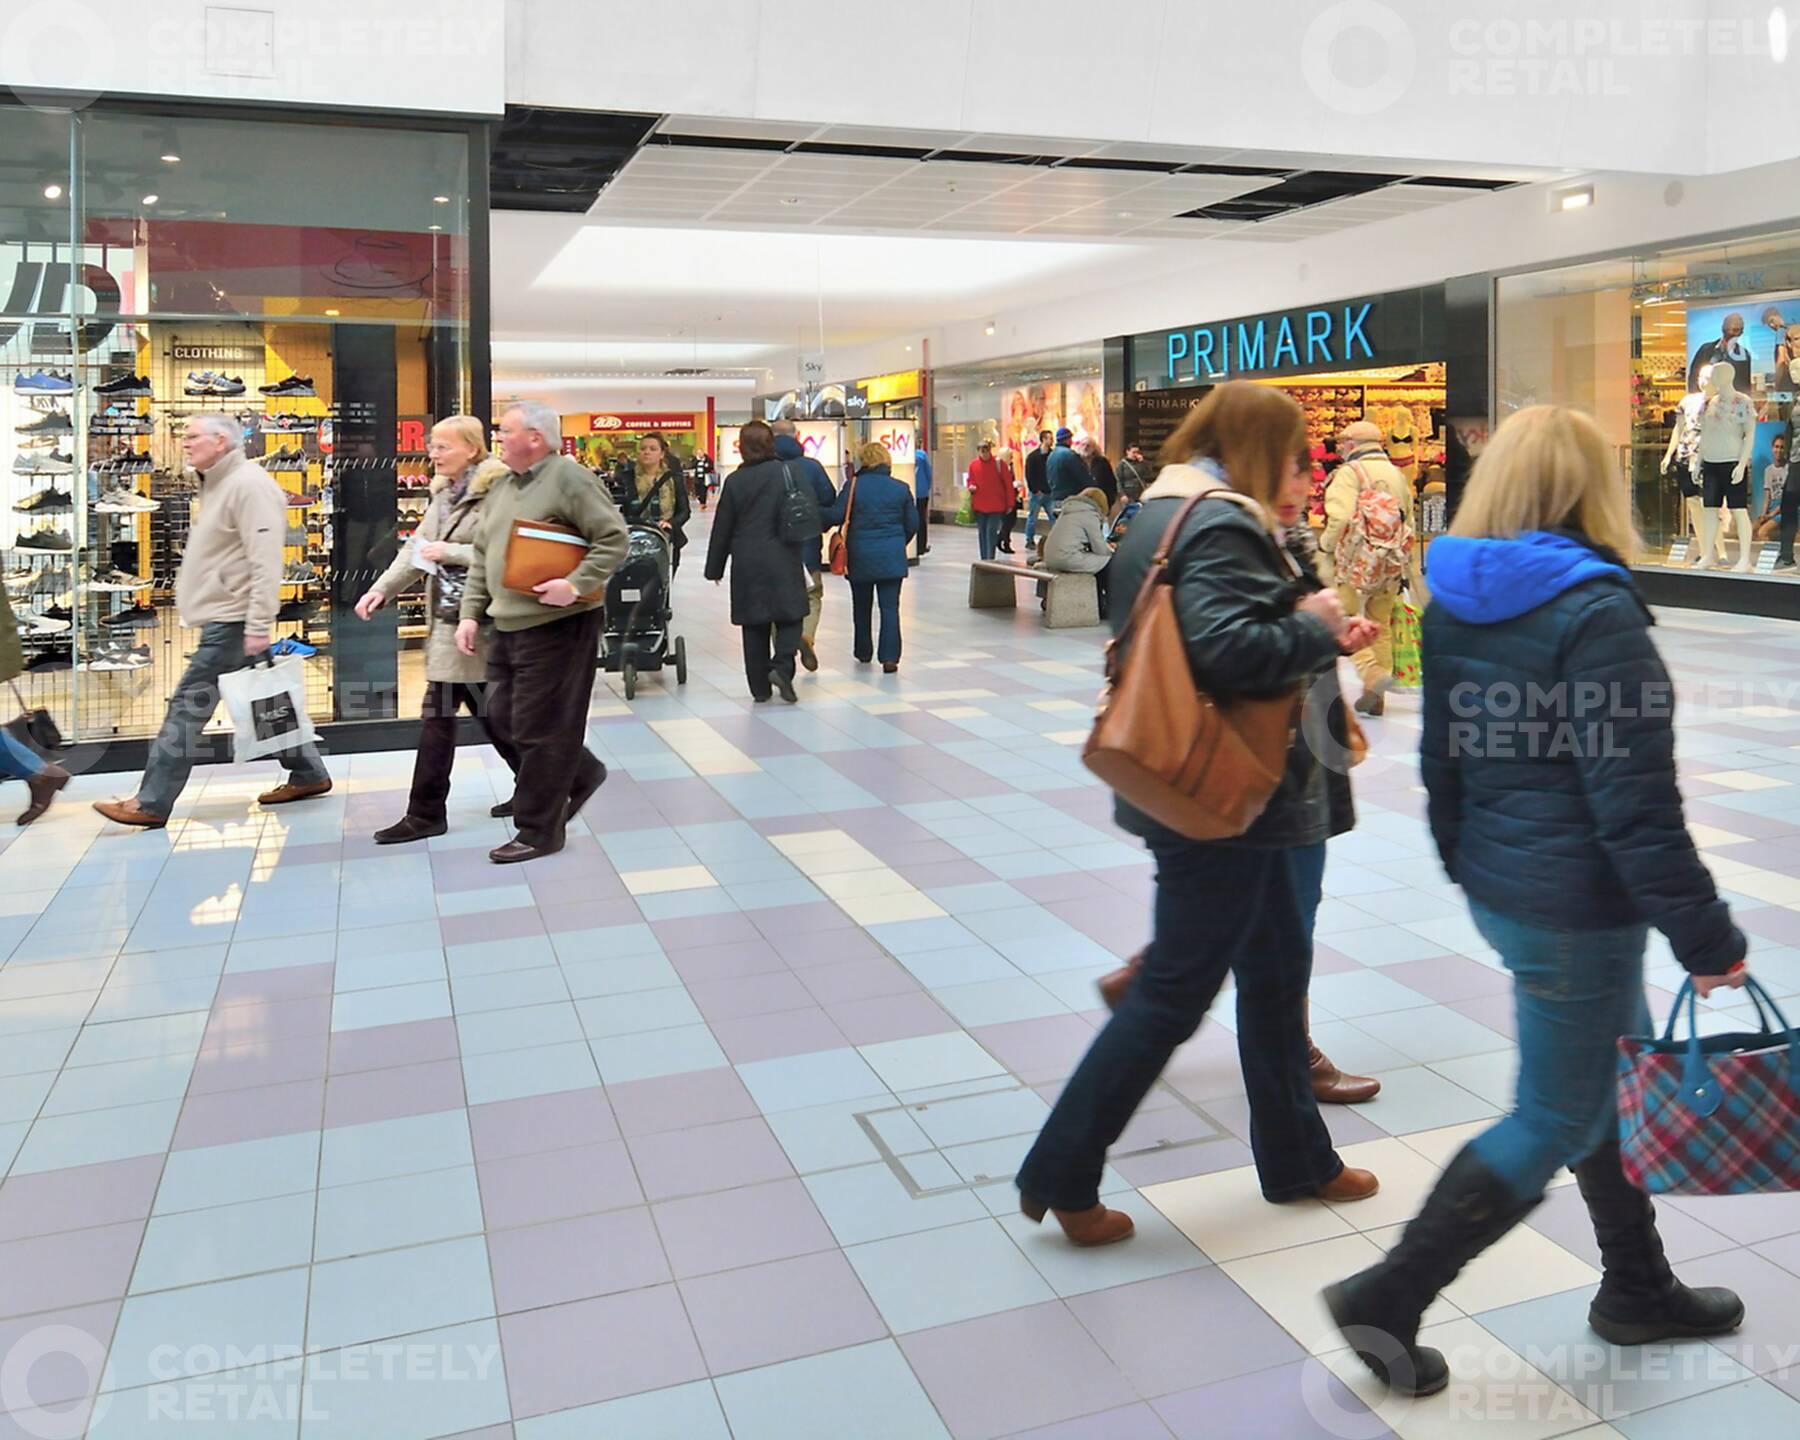 St Johns Shopping Centre